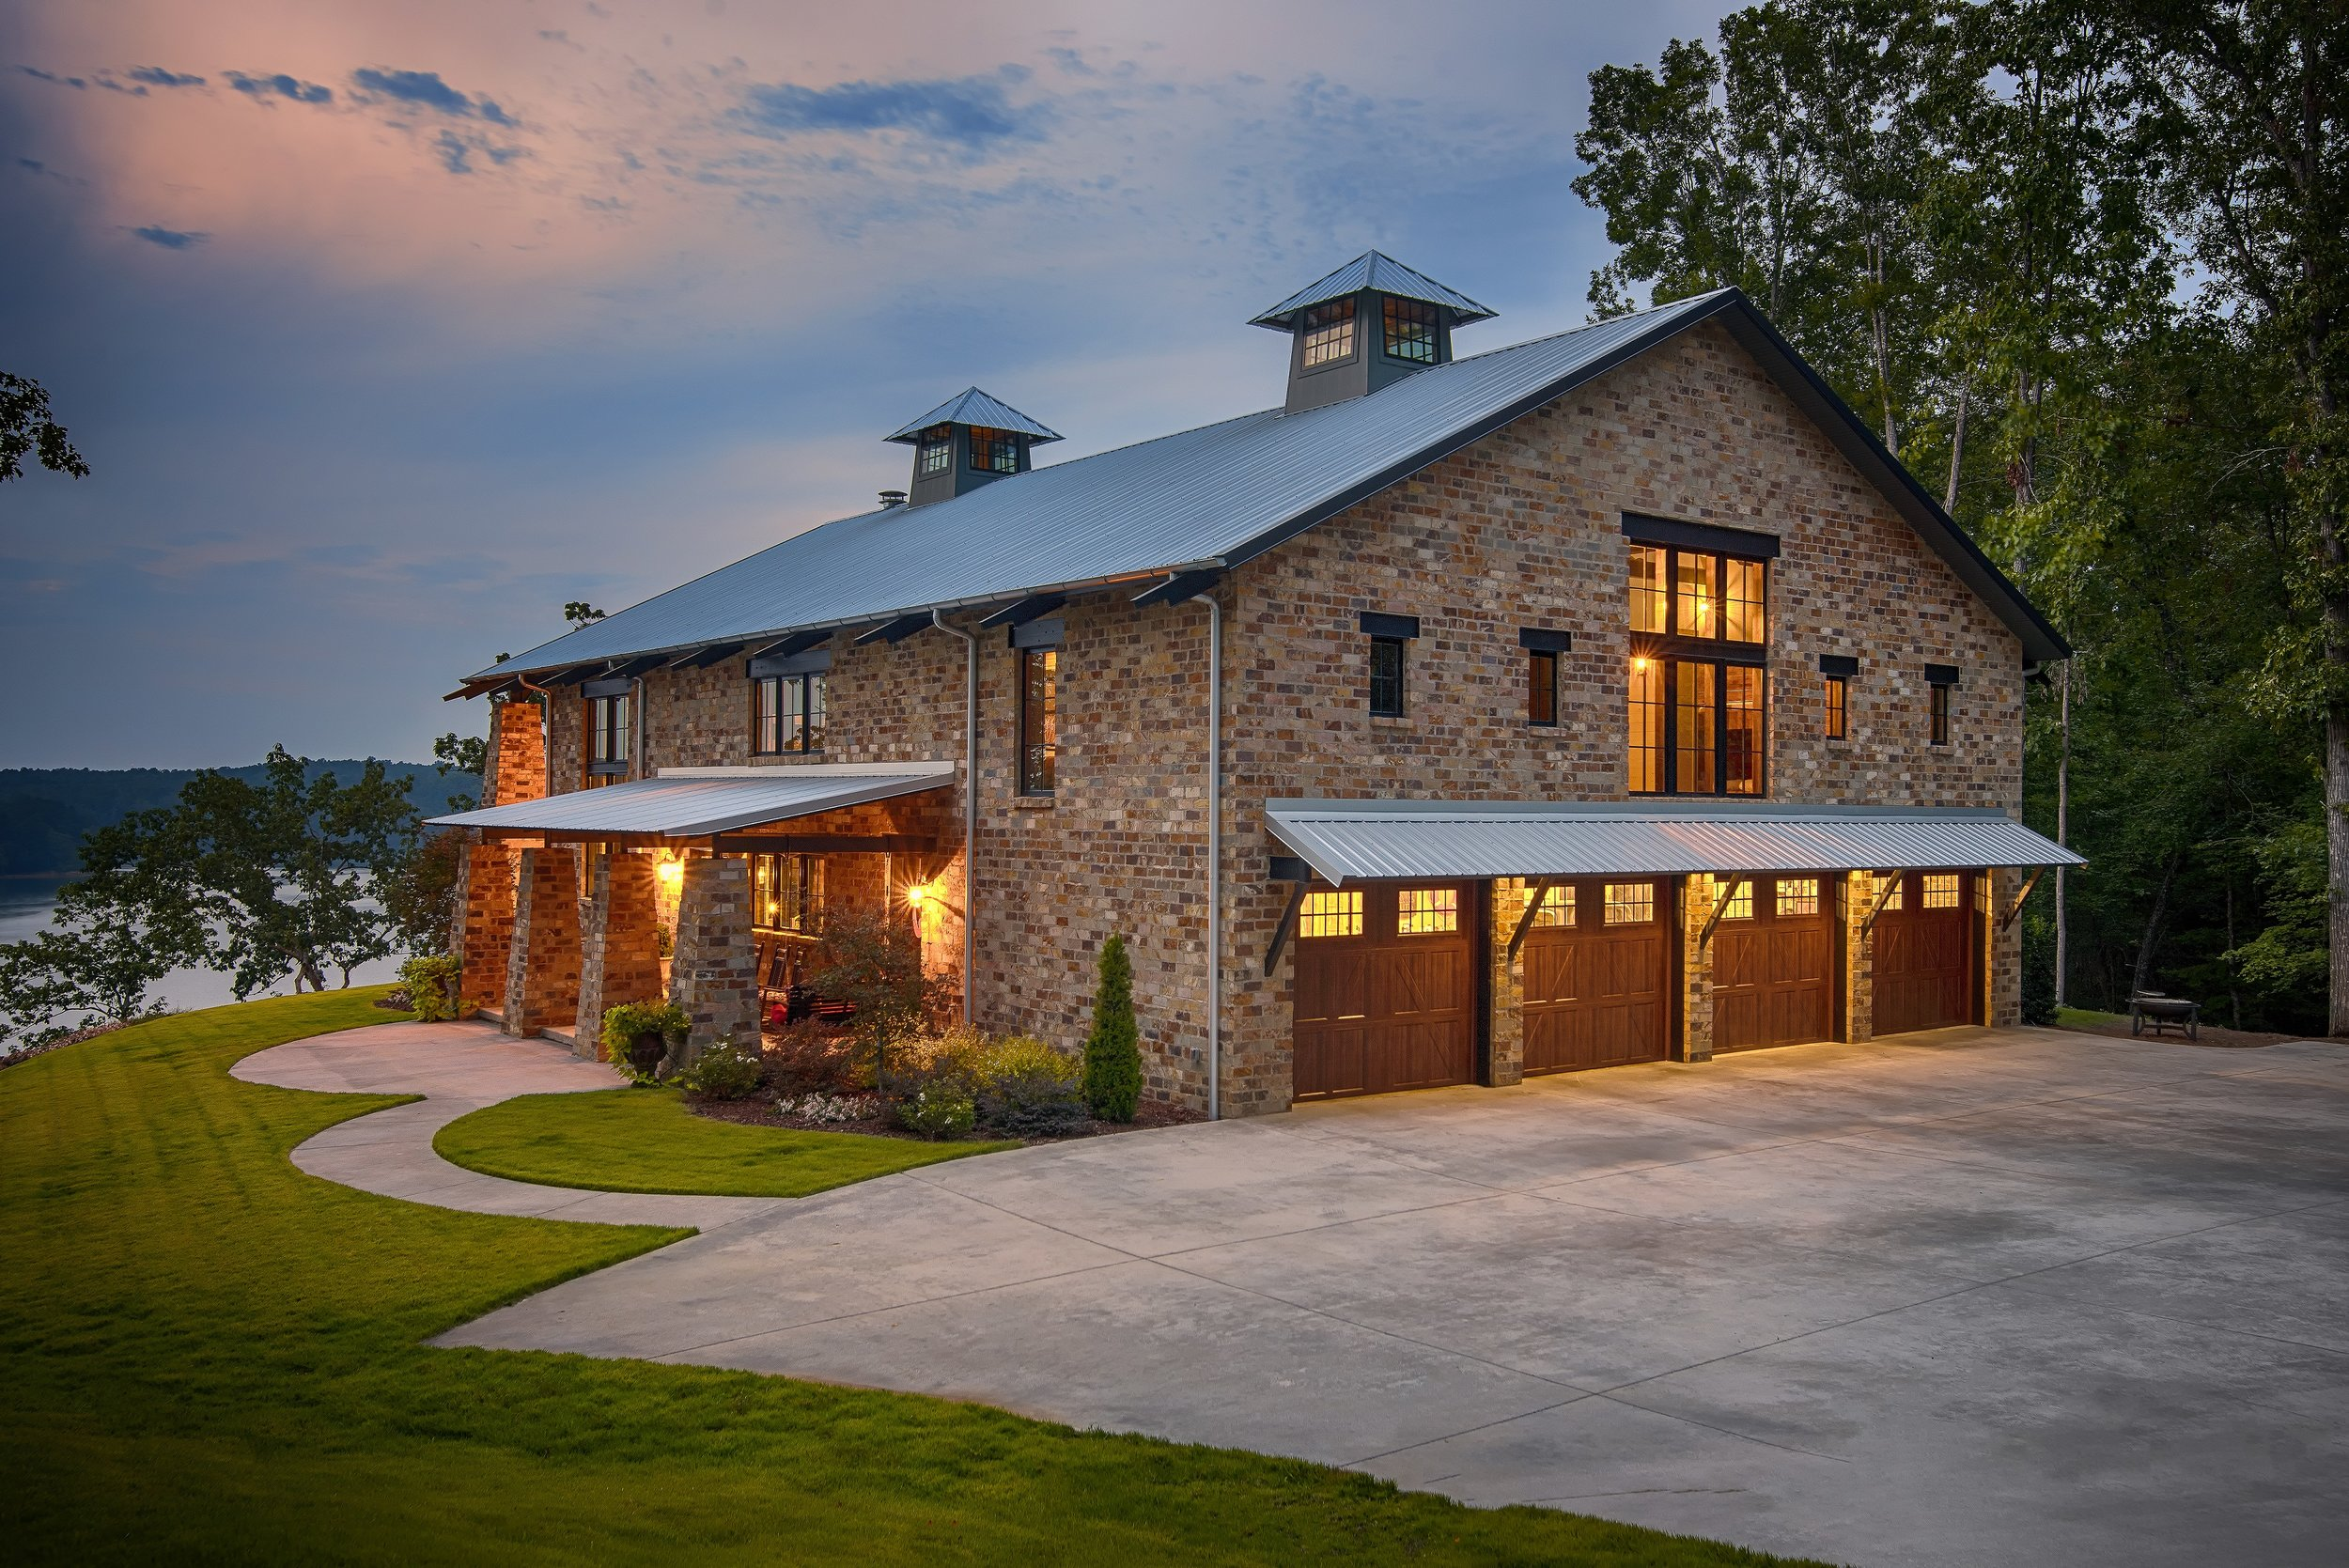 Crider Lake House magazine feature 2017 architecture and design Alabama